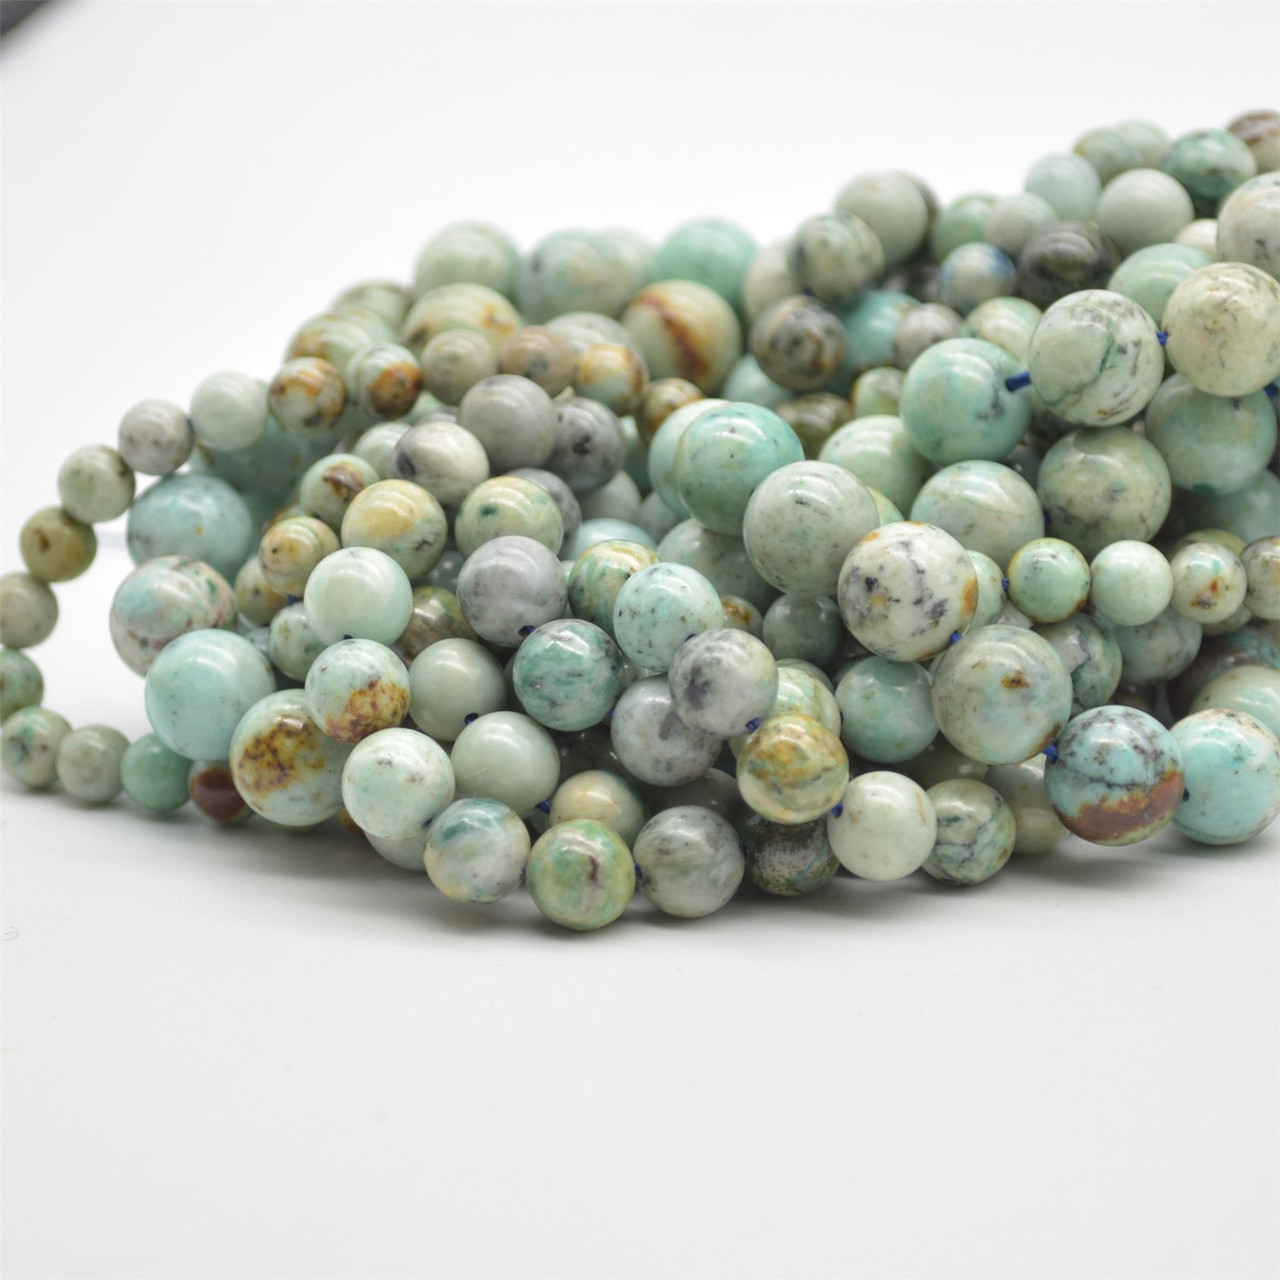 6mm Approx 15.5 strand High Quality Grade A Natural Chrysocolla in Quartz Semi-precious Gemstone Round Beads 10mm sizes 8mm